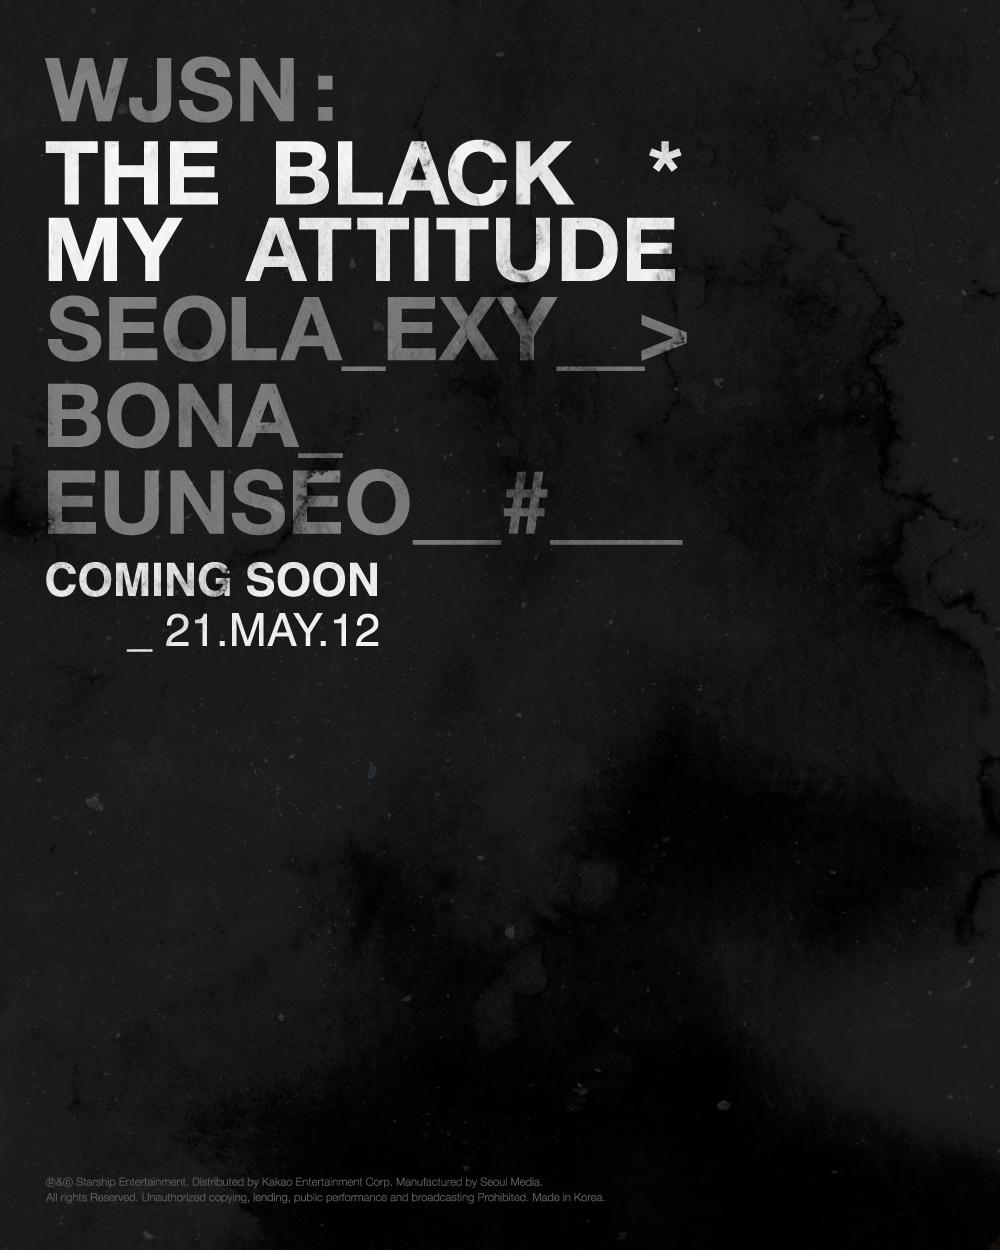 WJSN-THE-BLACK-My-Attitude-coming-soon